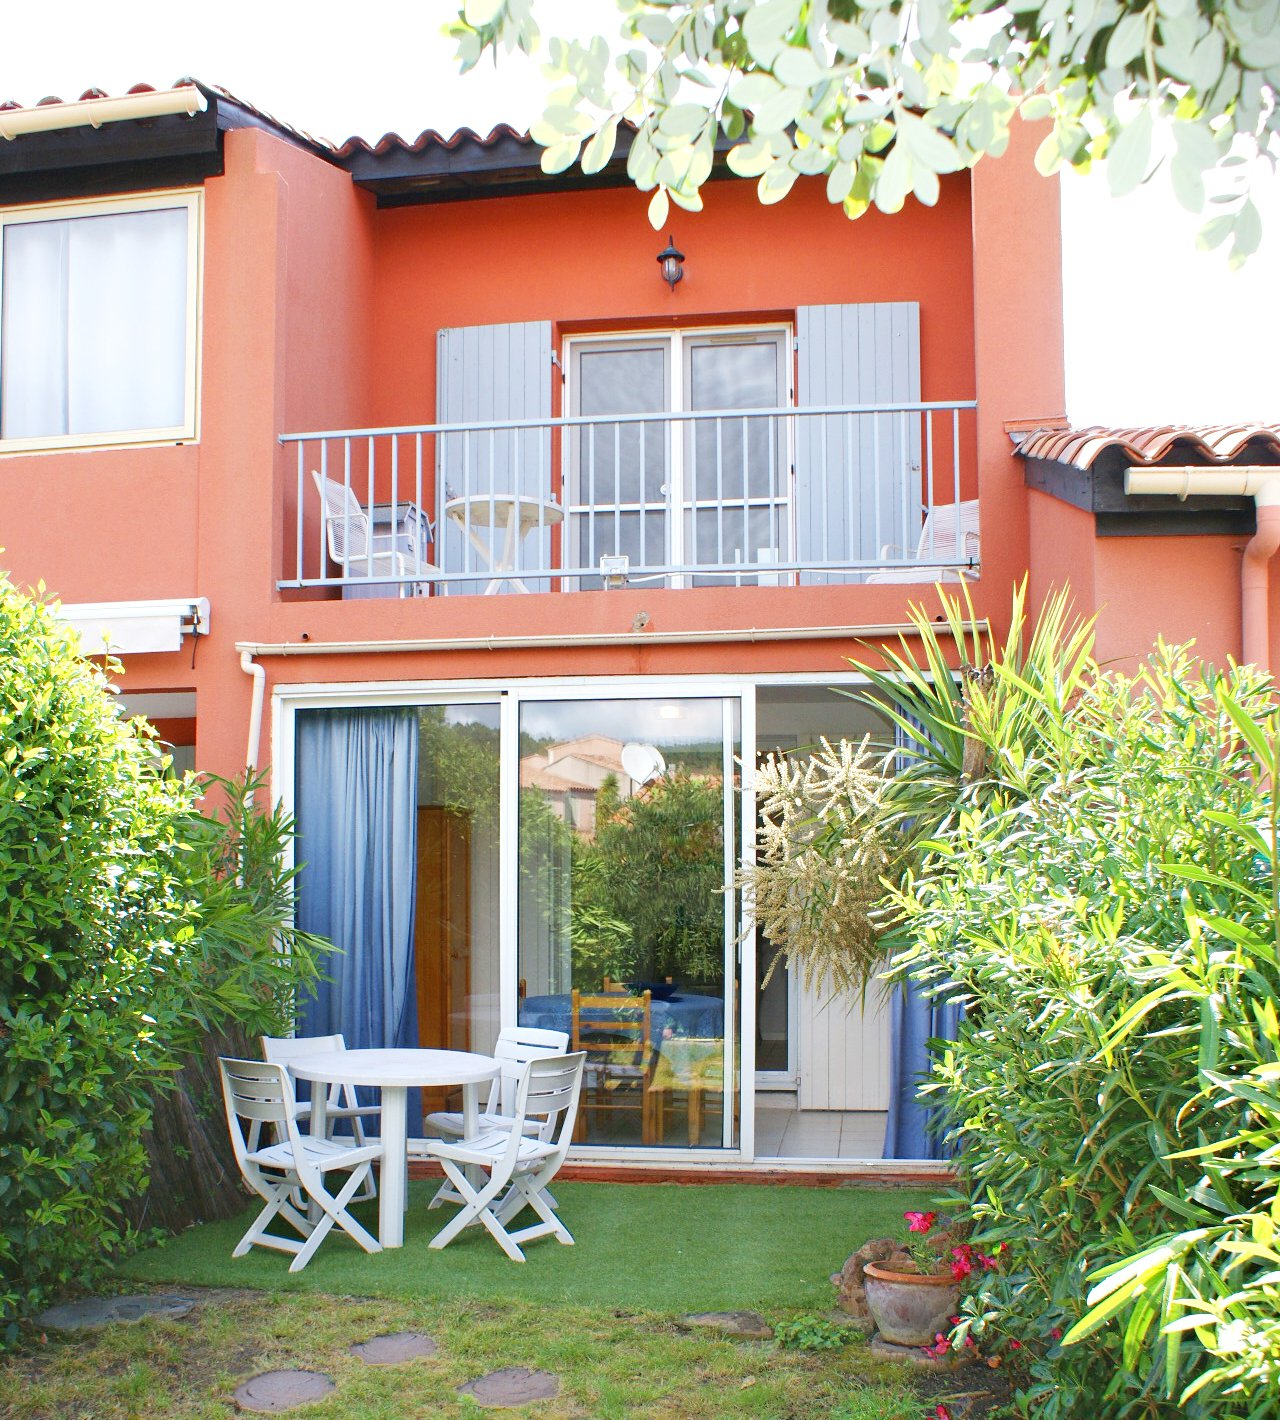 3-room terraced house on 2 floors with small garden